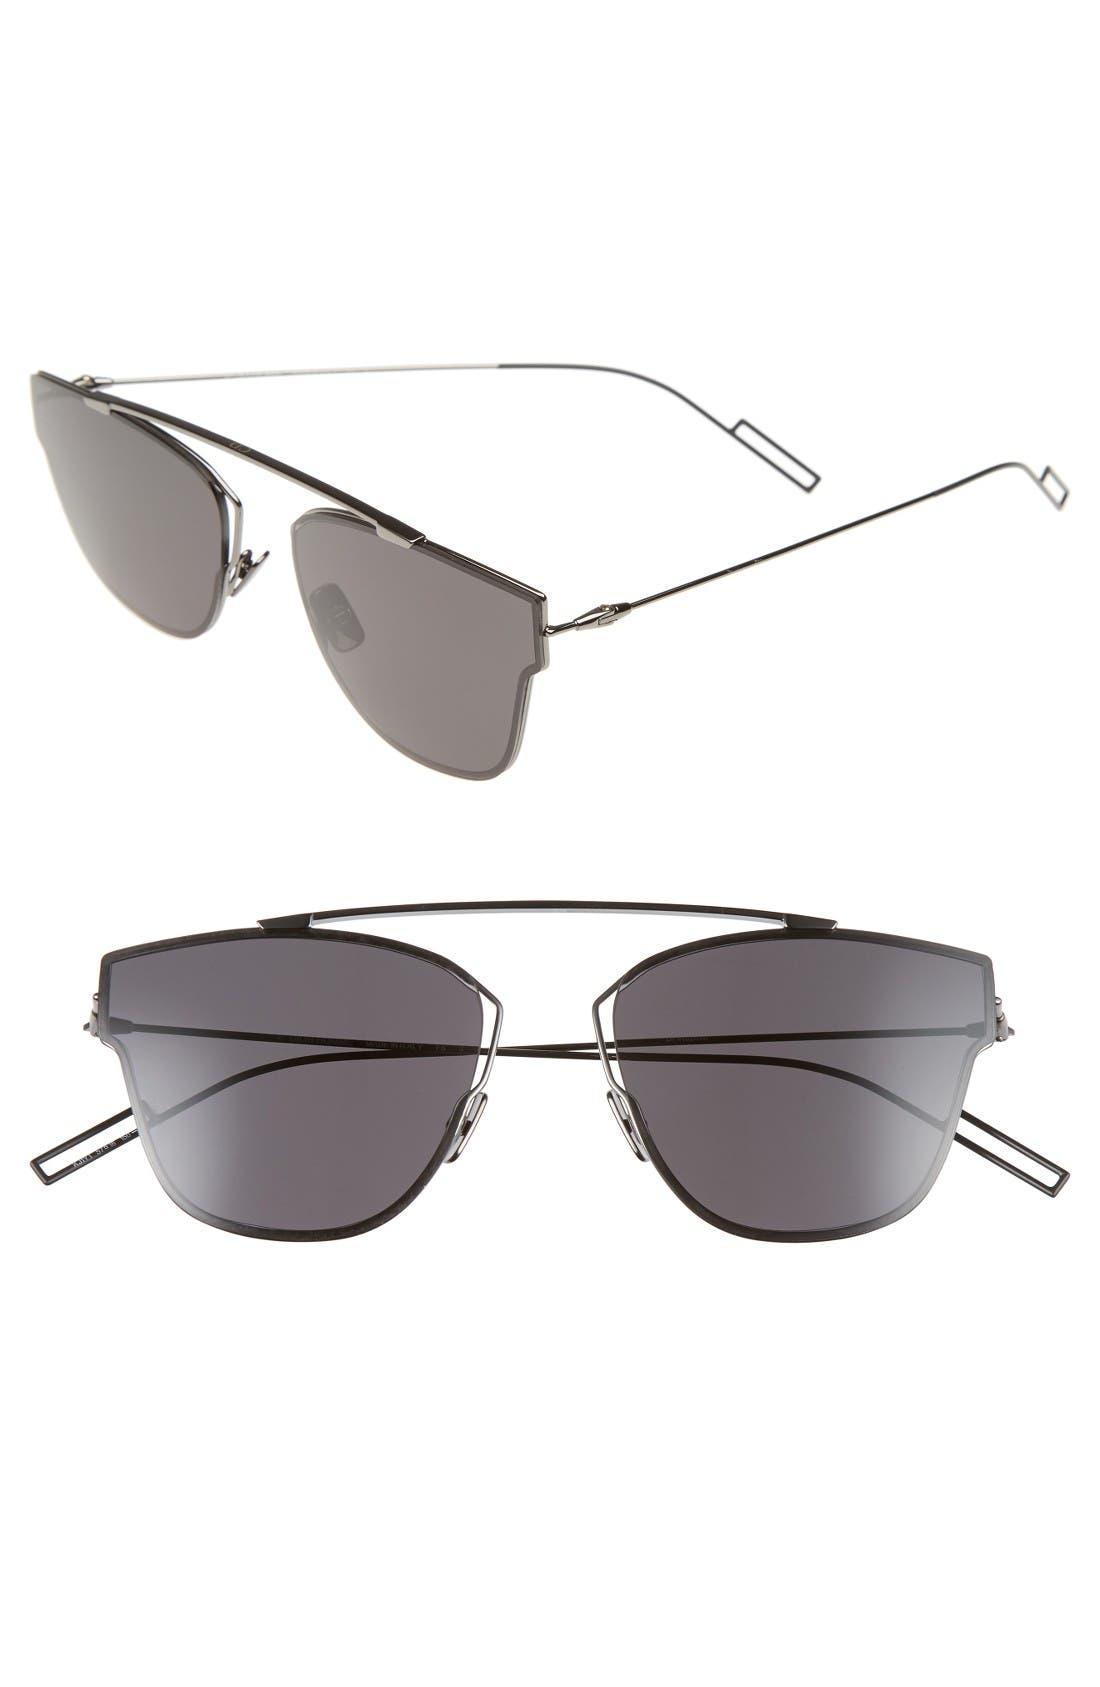 Main Image - Dior Homme 57mm Semi Rimless Sunglasses